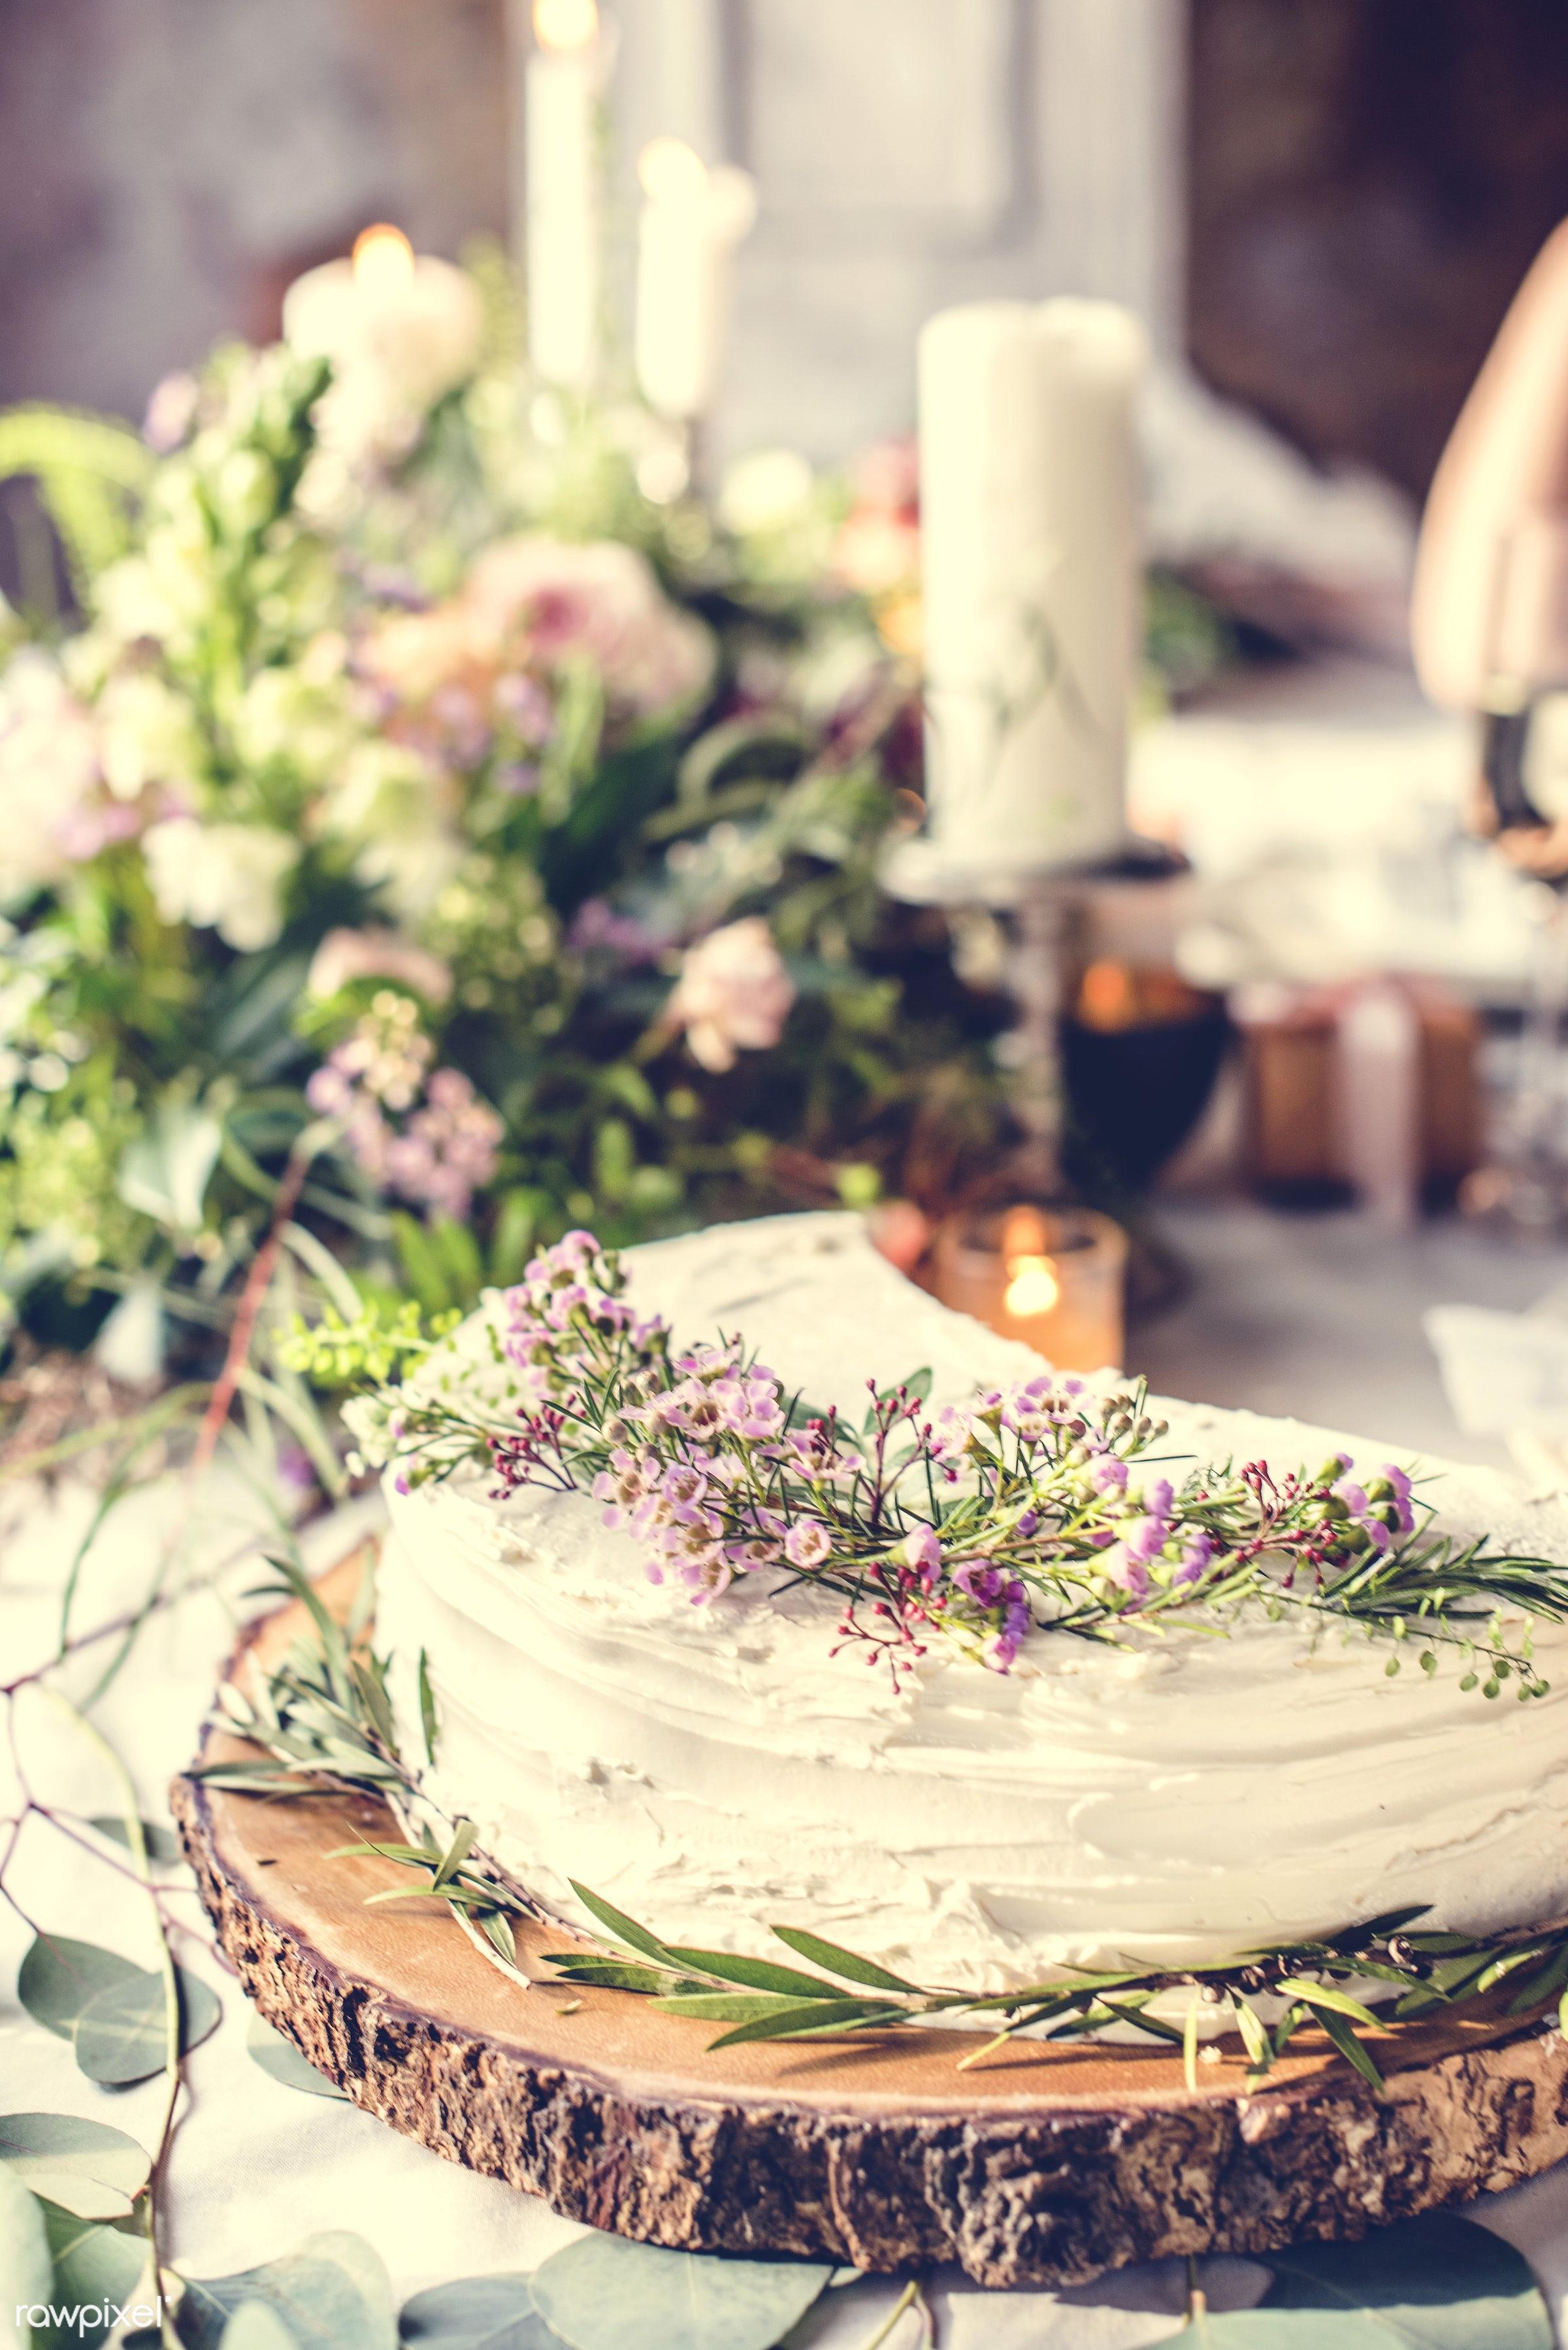 dish, nobody, recipe, appetite, party, taste, candle, event, flowers, gourmet, dessert, shared, cake, ceremony, cream, tasty...